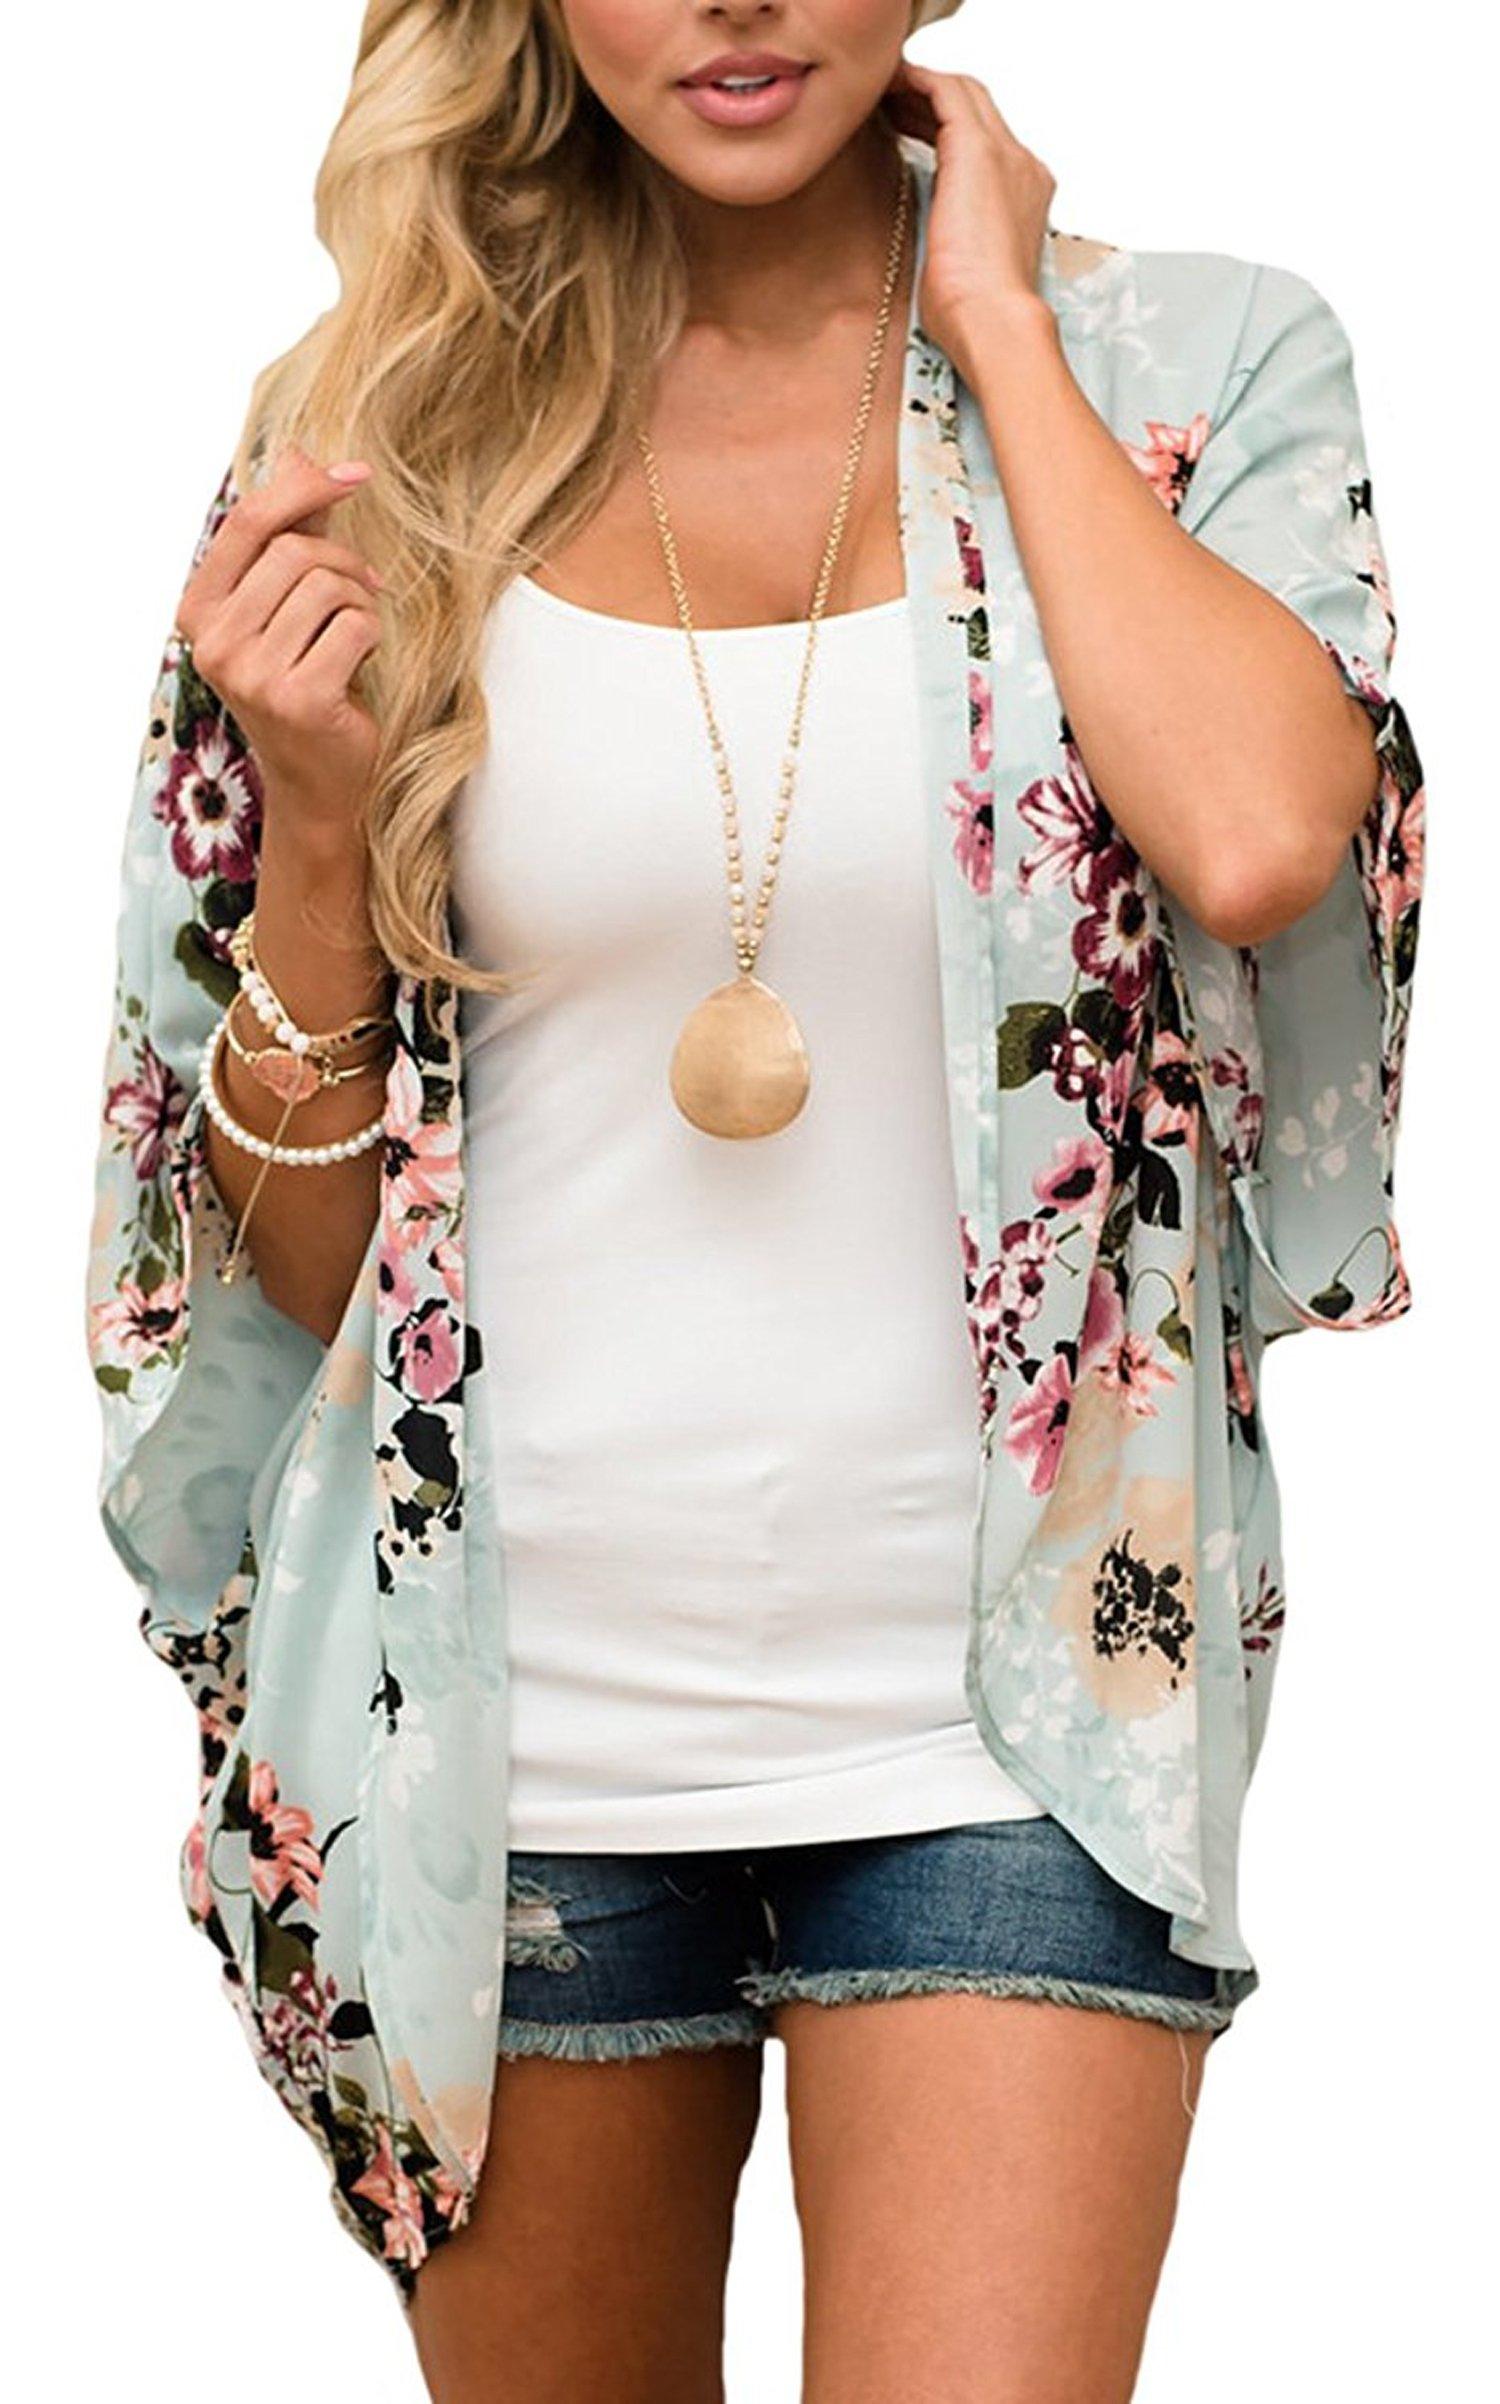 Hibluco Women's Fashion Floral Print Kimono Cardigan Long Tops Loose Cover Ups (Small, K 68)